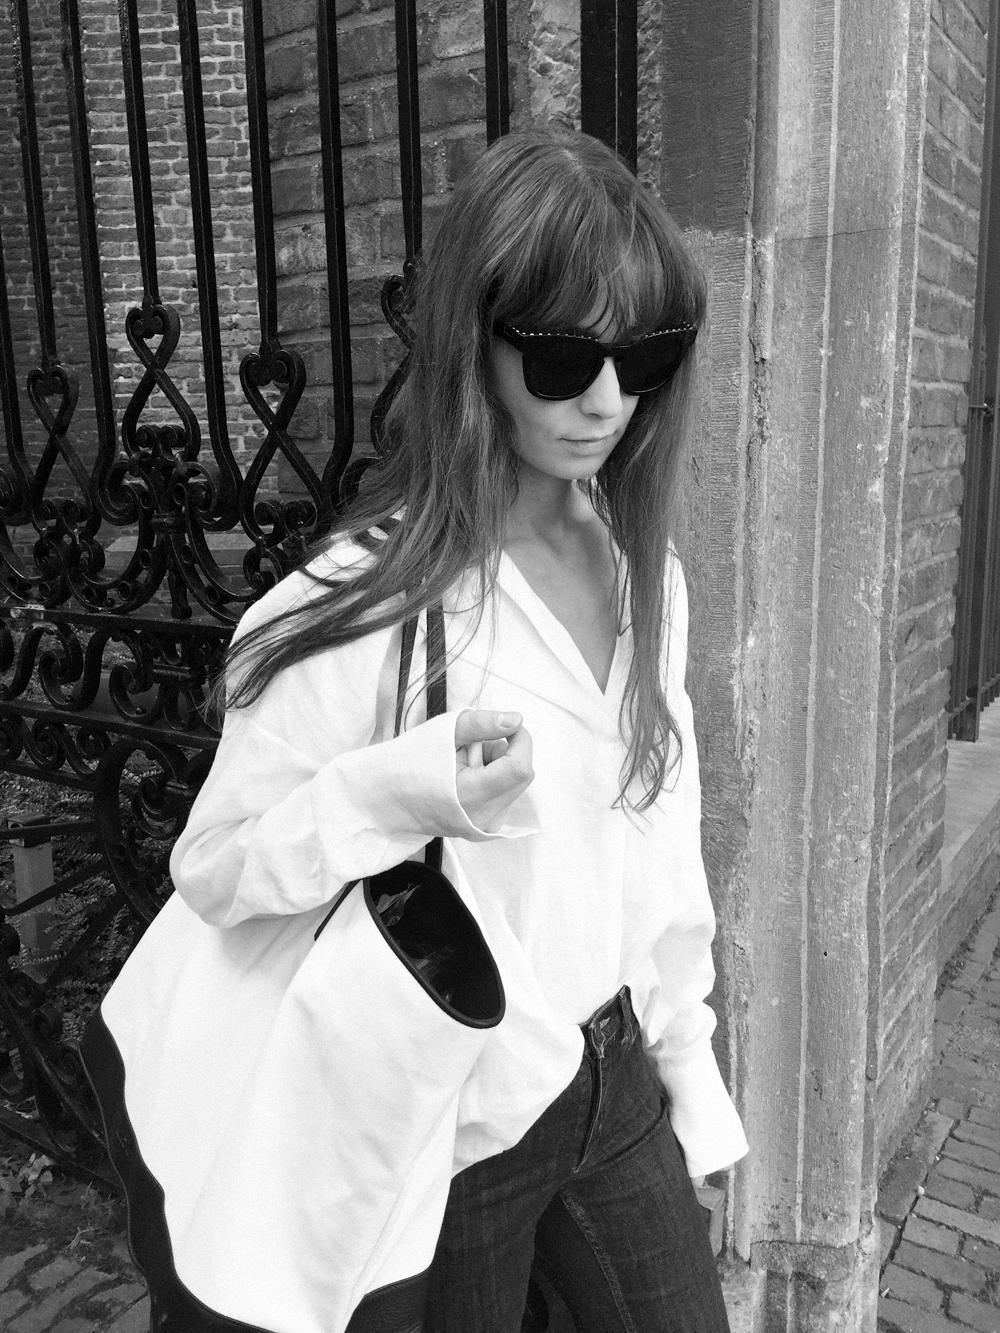 Givenchy sunnies - Zara shirt - COS denim - Haus of Mana bag - Gucci Loafer.png